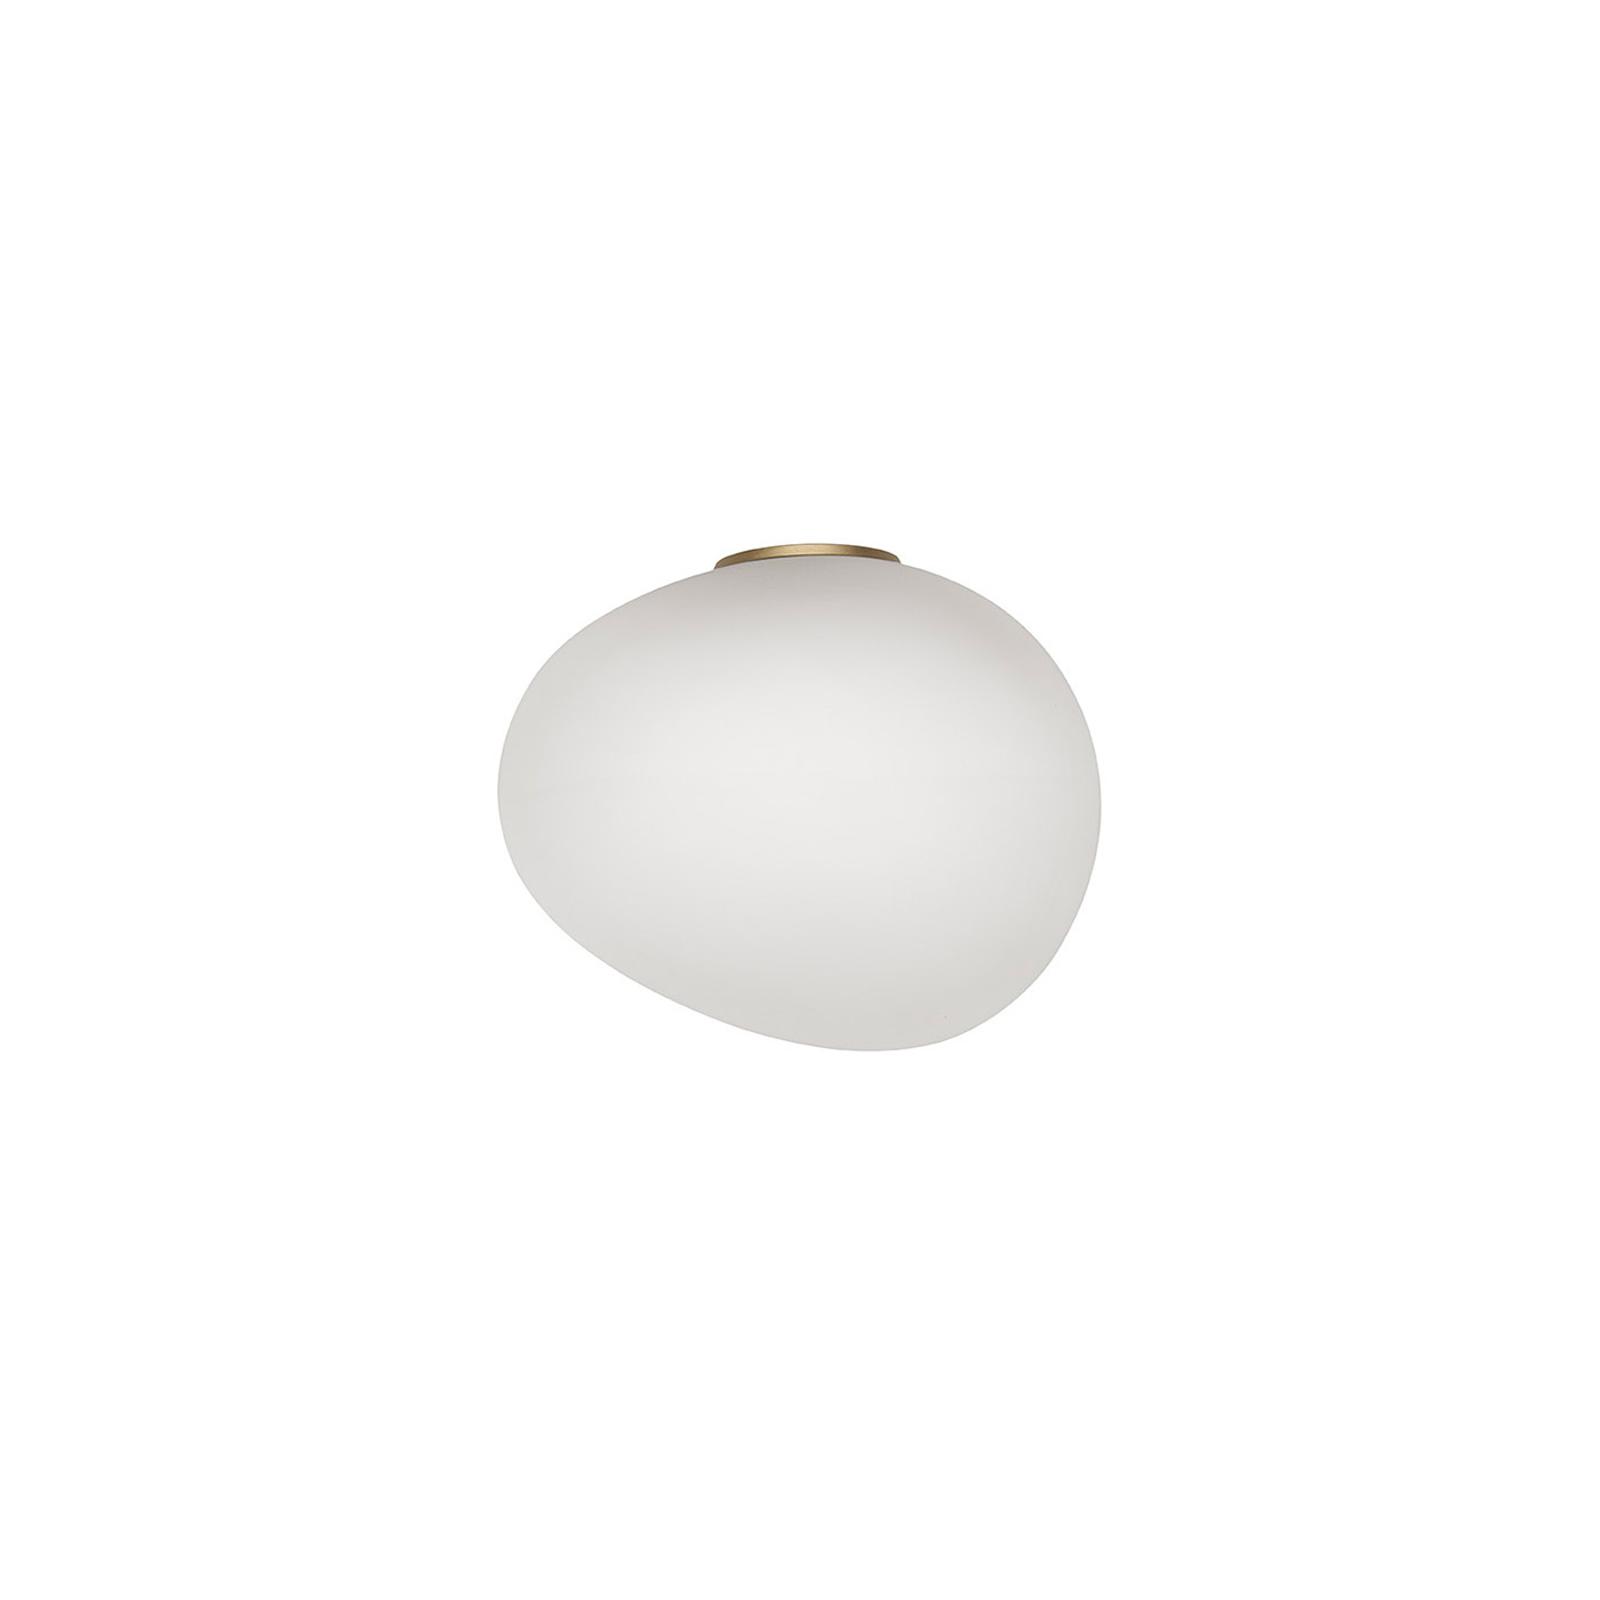 Foscarini Gregg media semi 1 Wandlampe, gold